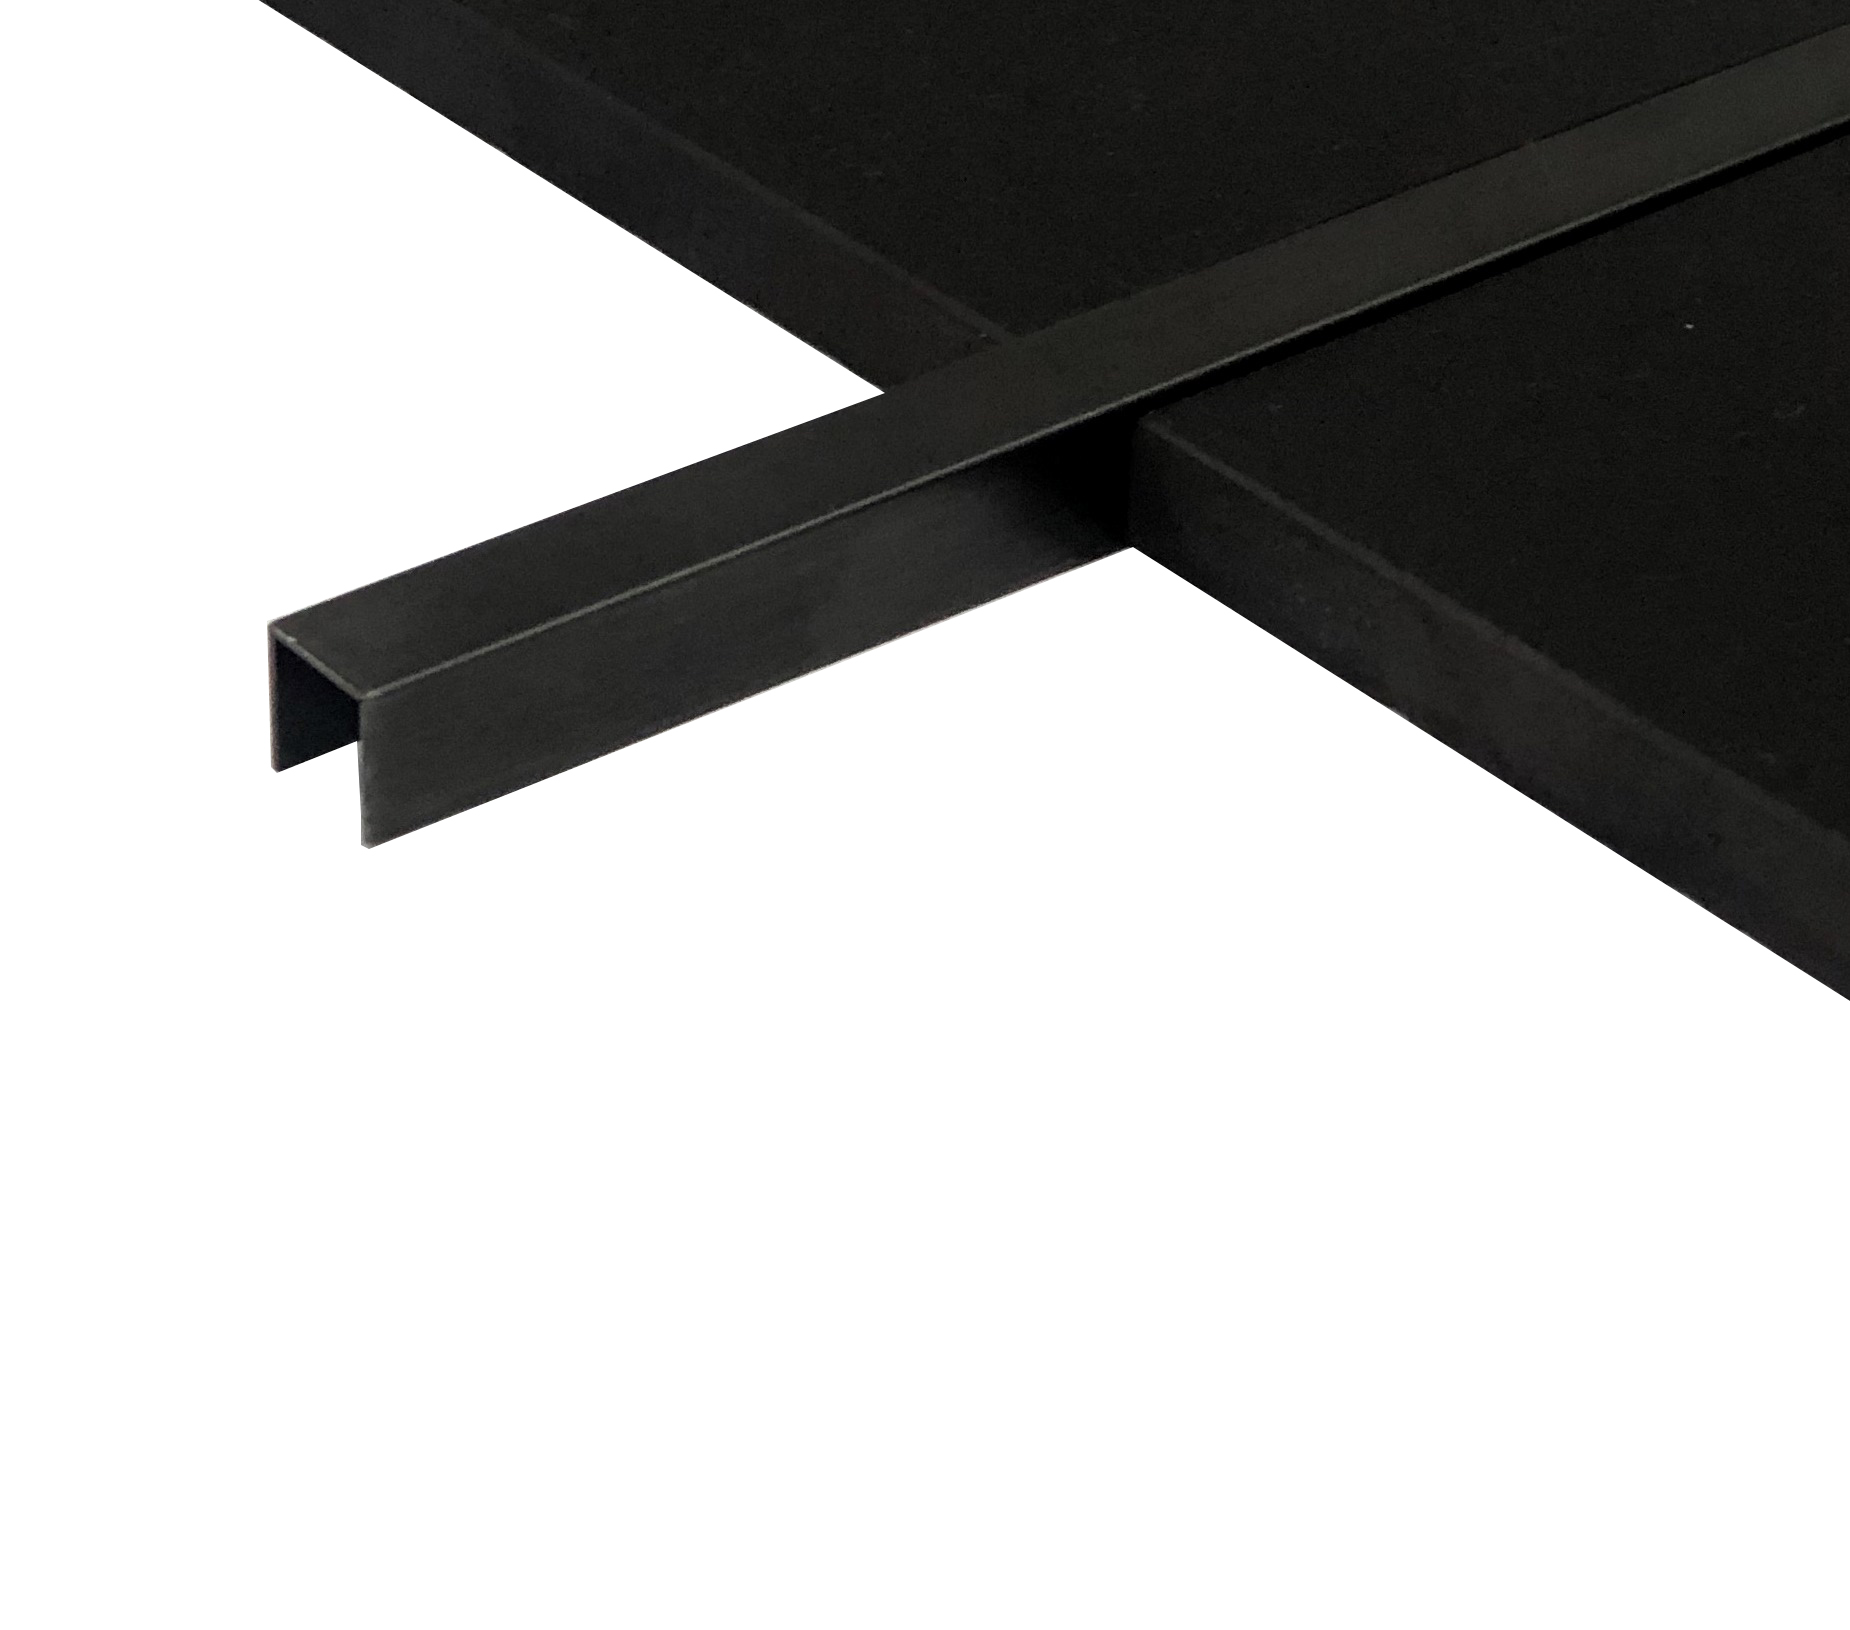 картинка Tile Trim SUP10-4B-10H Black отJuliano